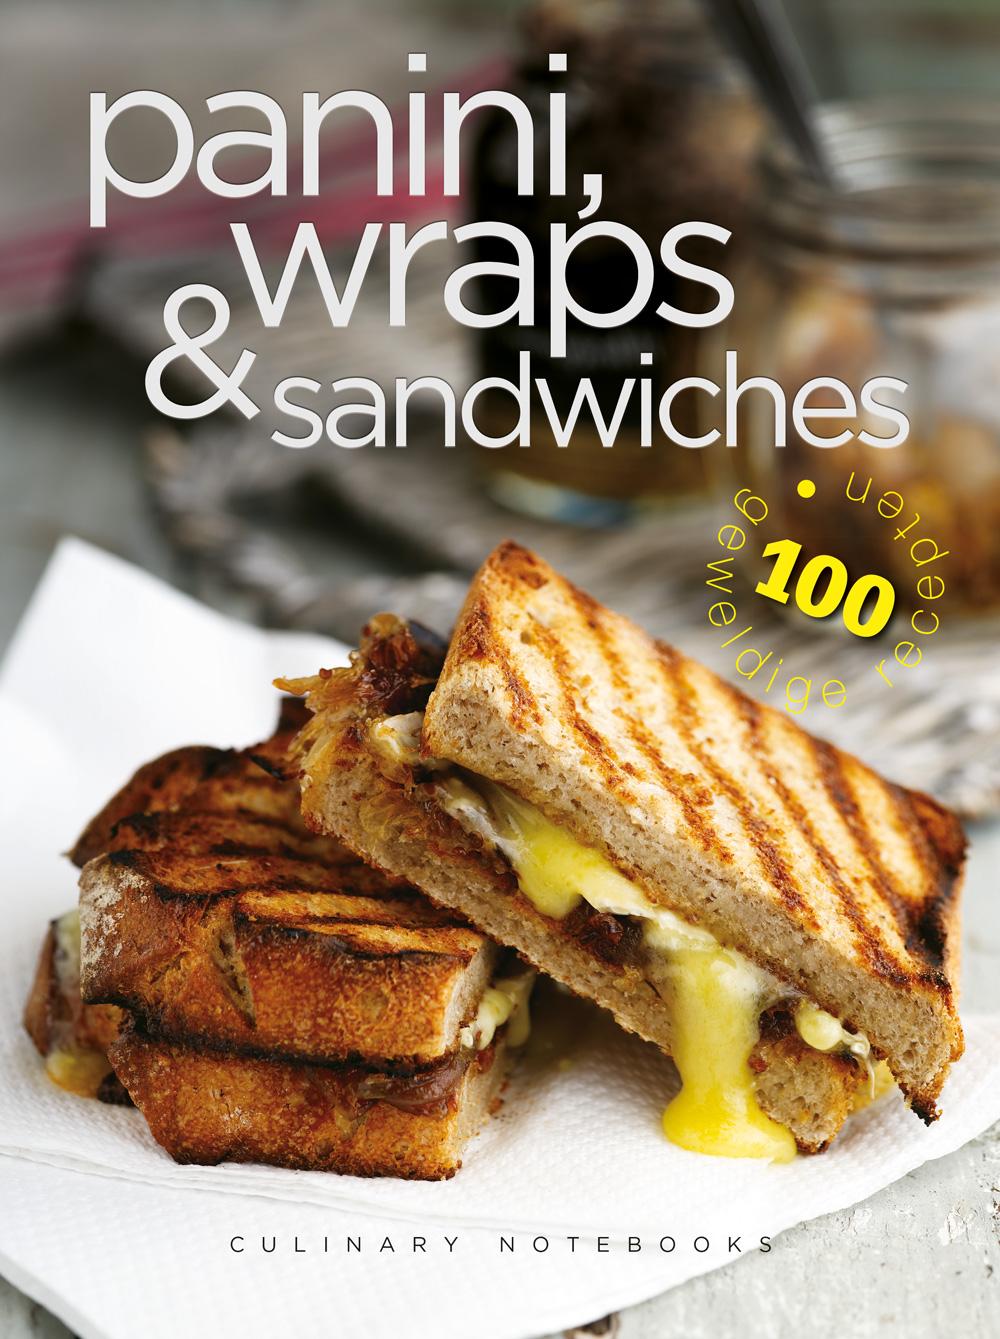 Culinary notebooks Panini,wraps&san